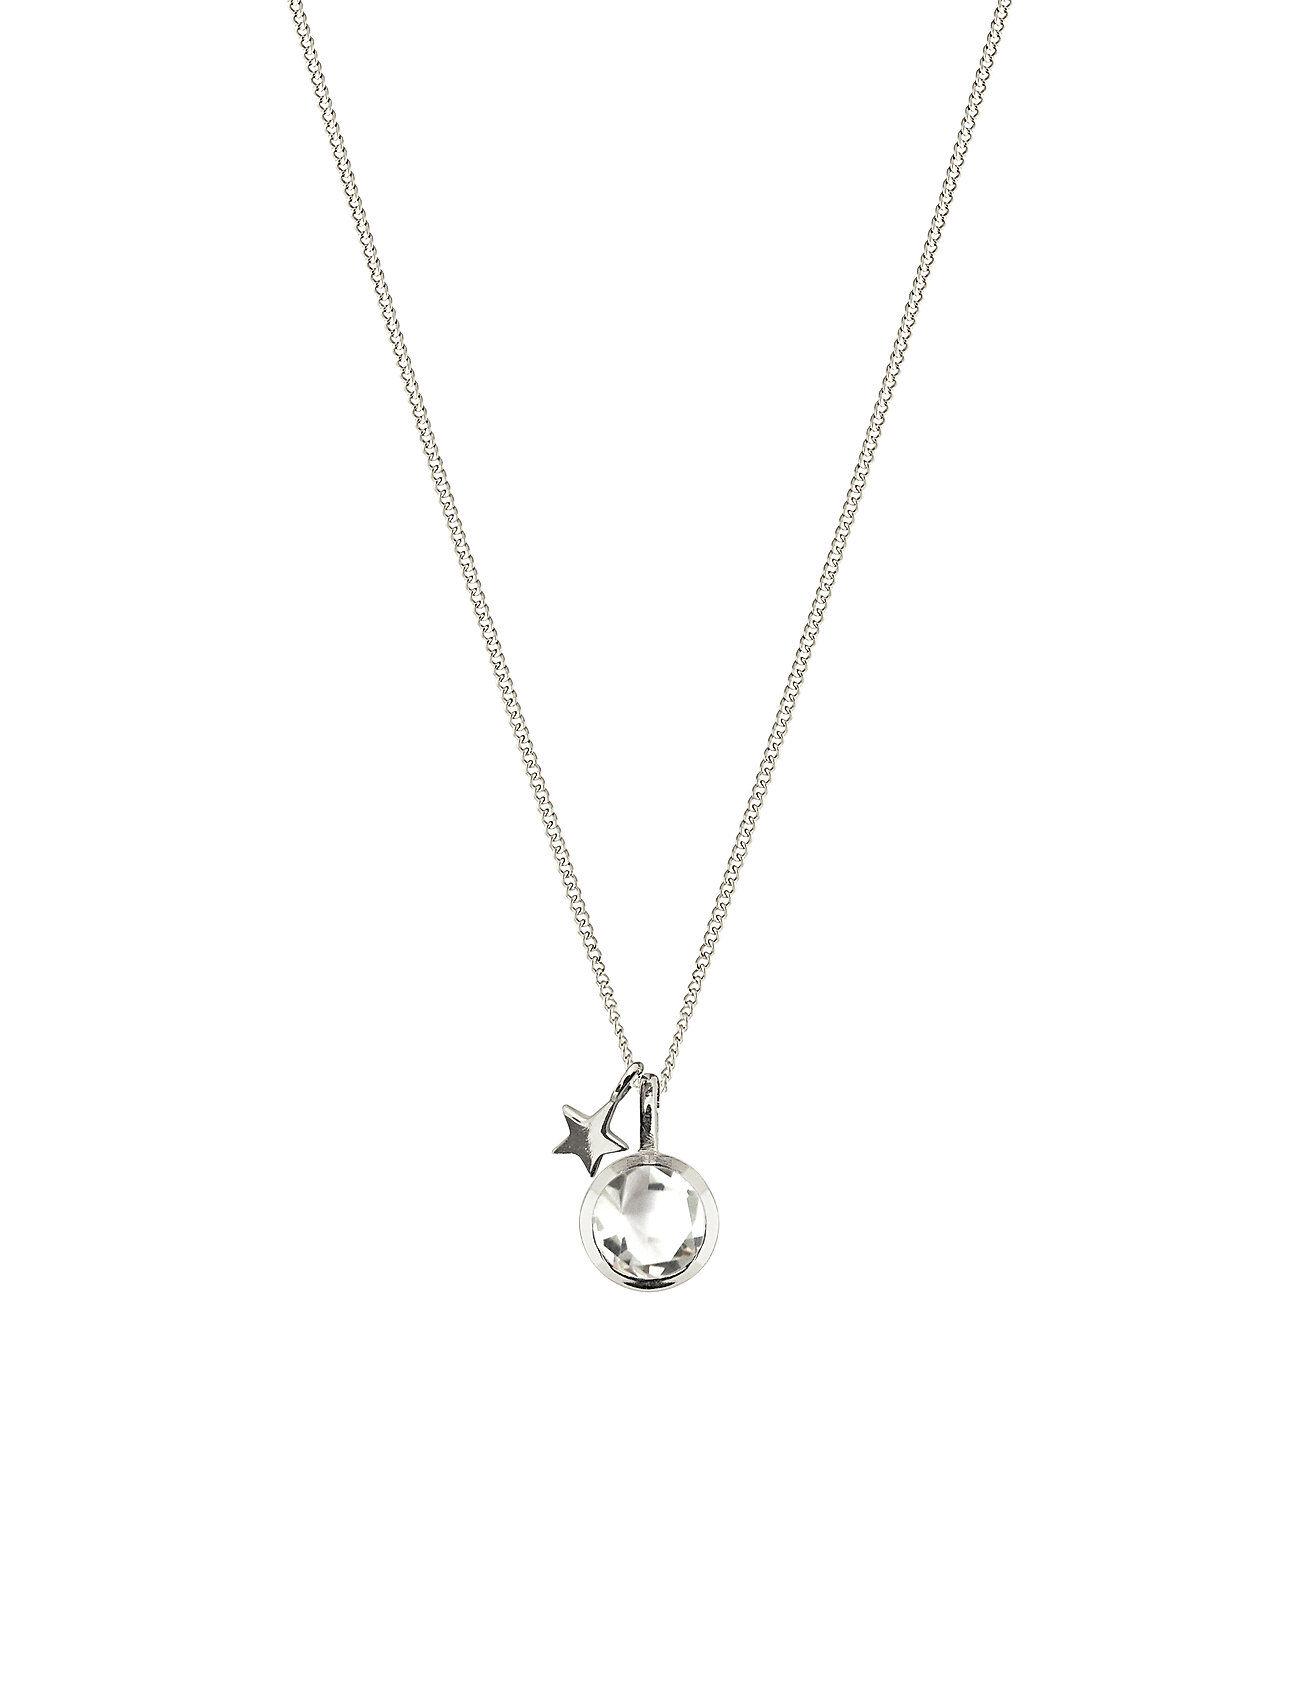 Syster P Priscilla Necklace Silver Crystal